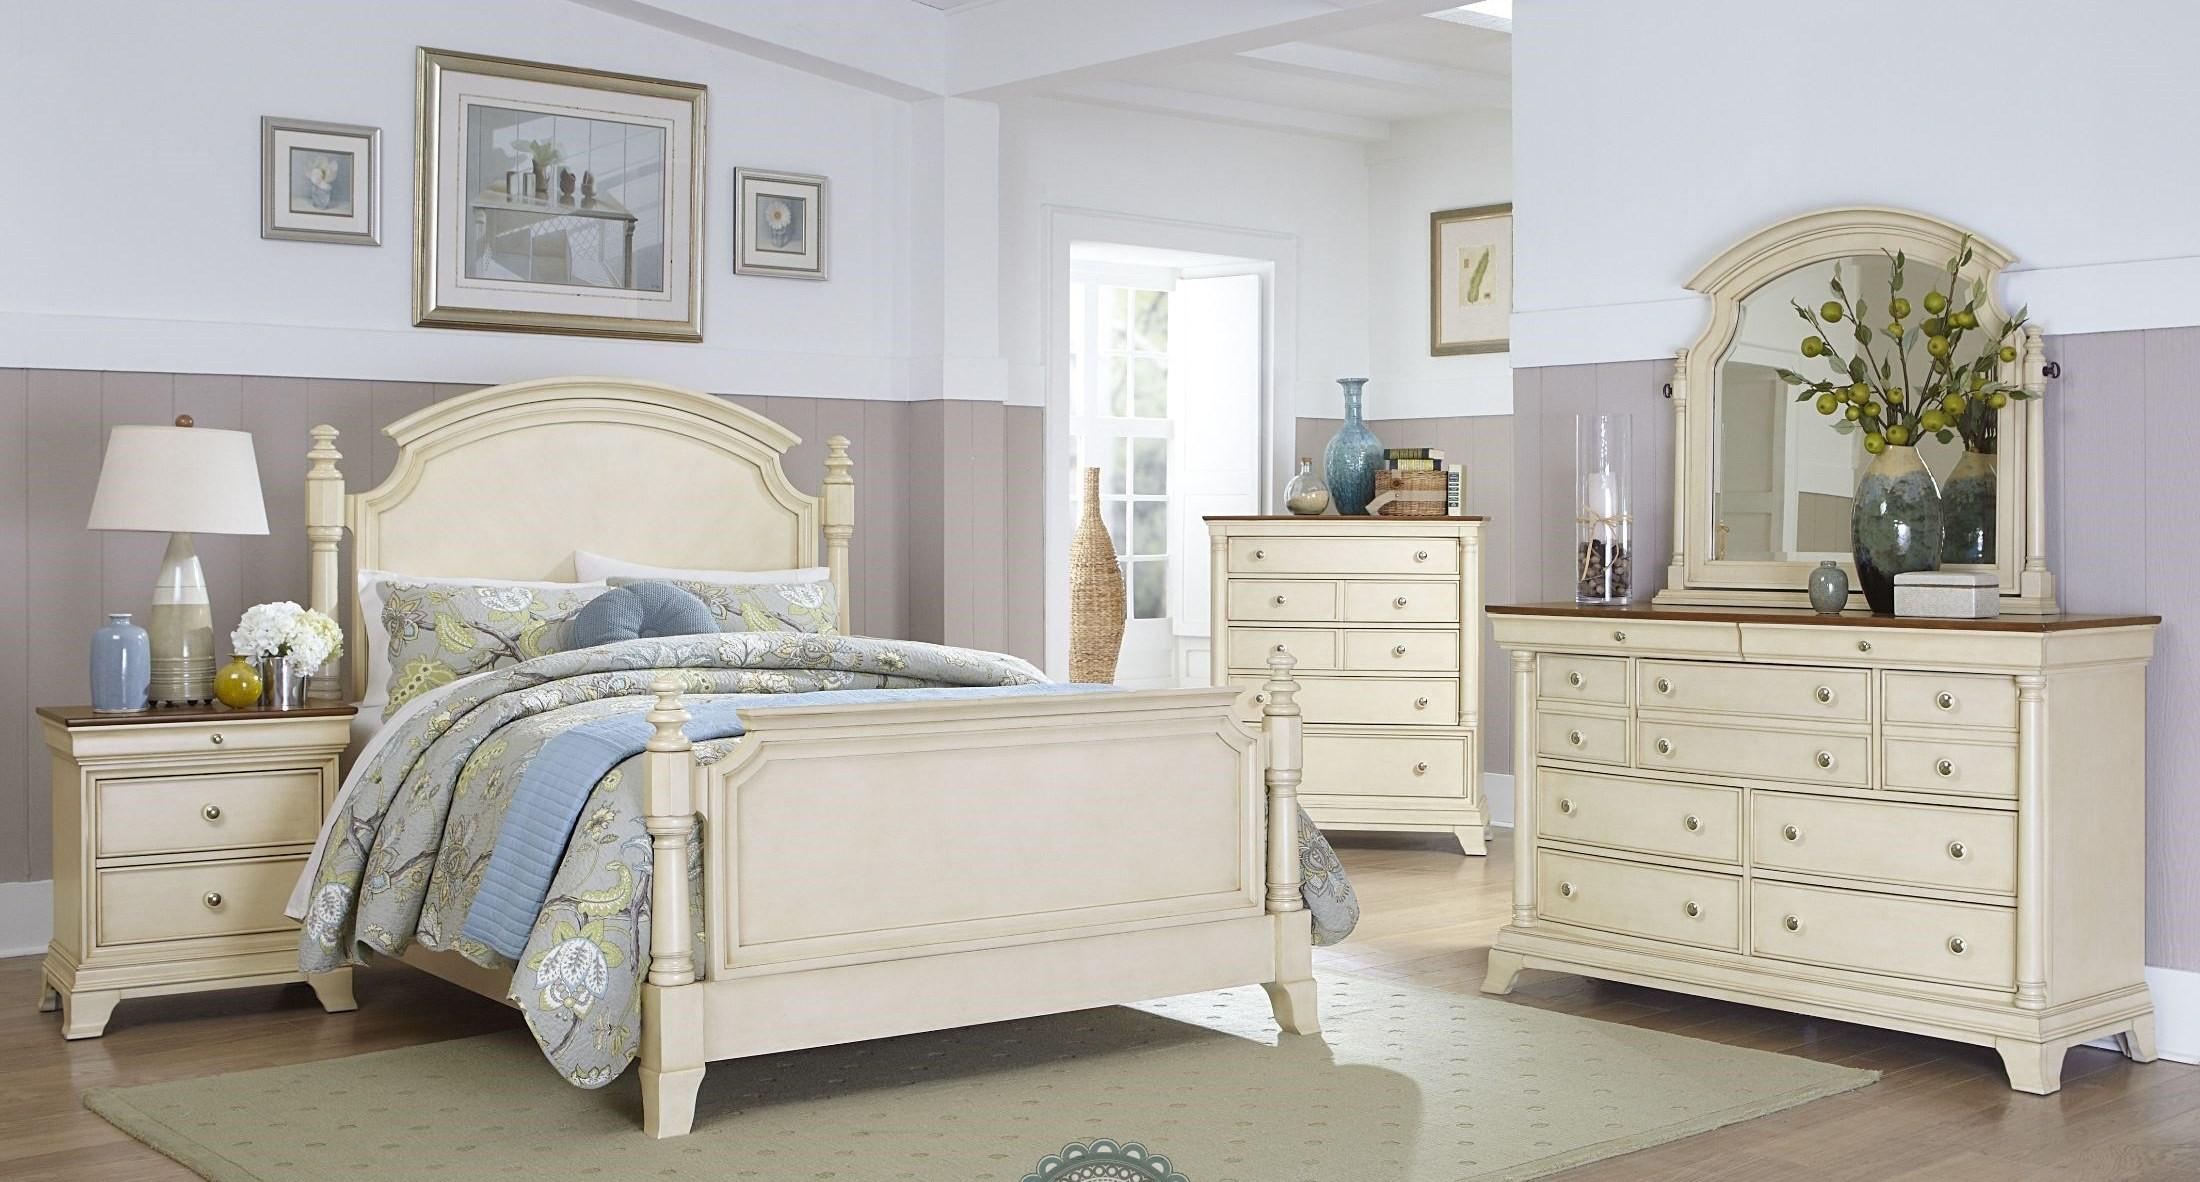 Inglewood White Poster Bedroom Set from Homelegance 1402W